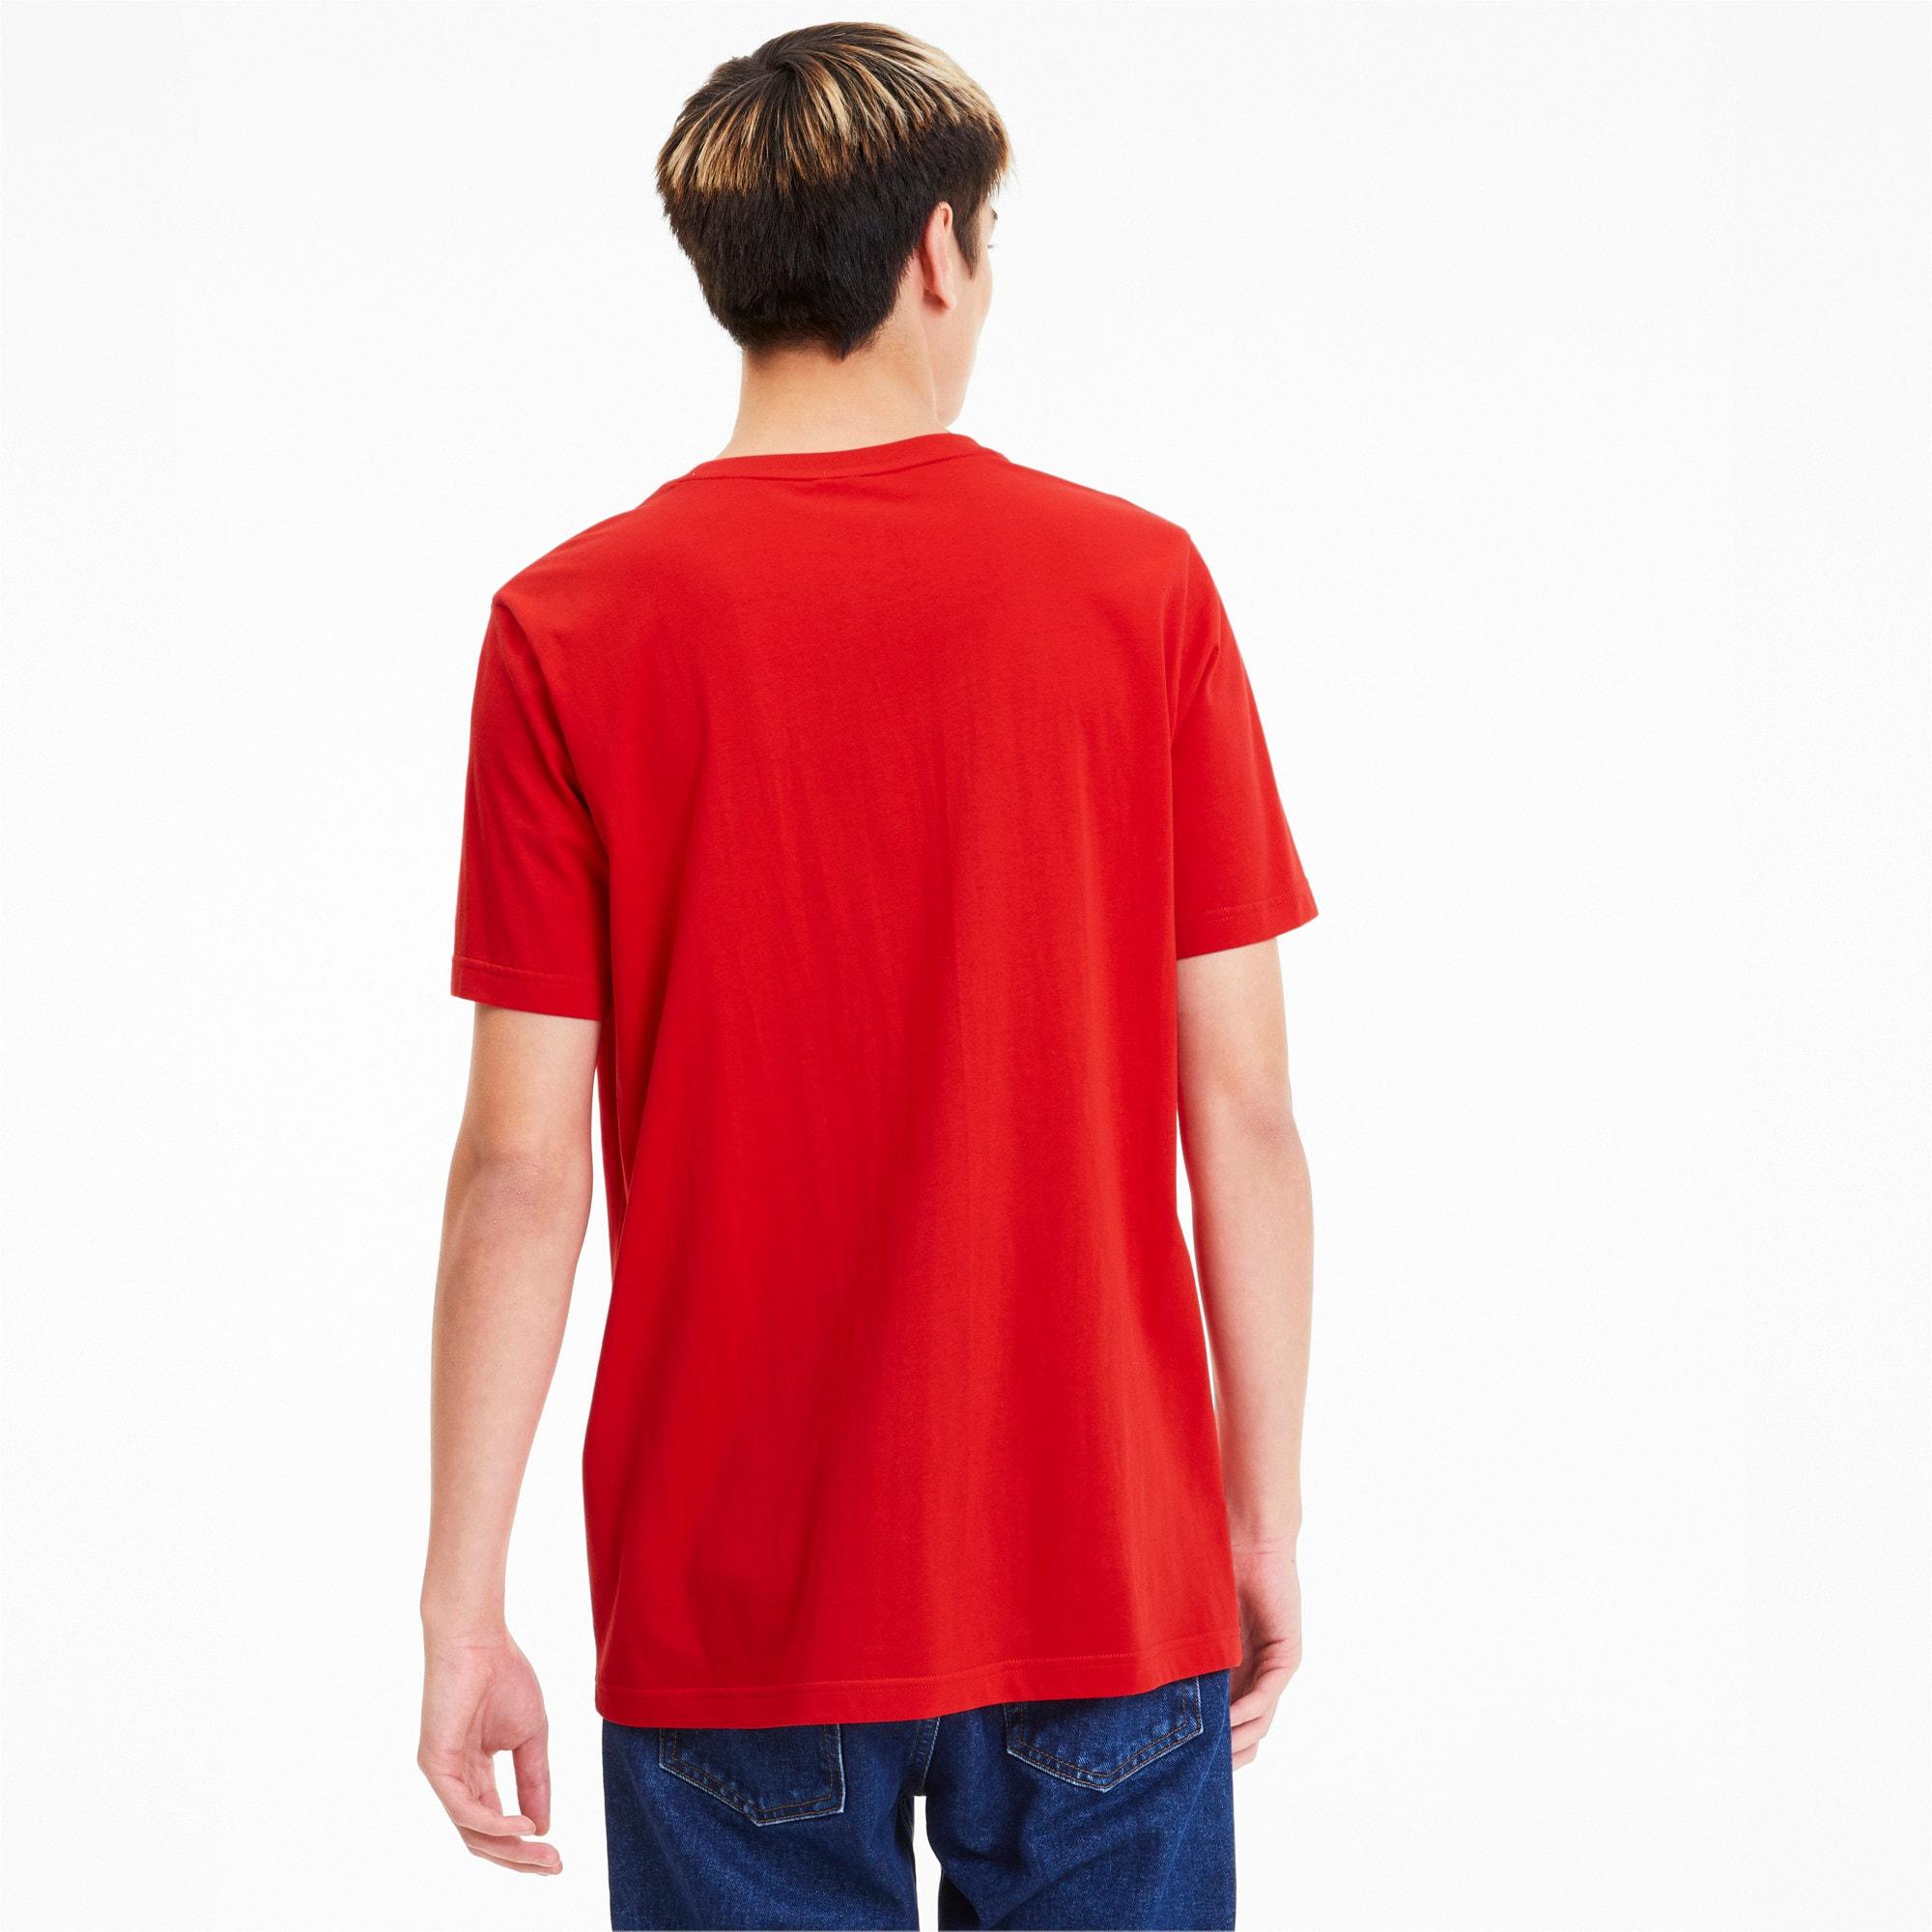 Thumbnail 2 of CLASSICS ロゴ SS Tシャツ 半袖, High Risk Red, medium-JPN